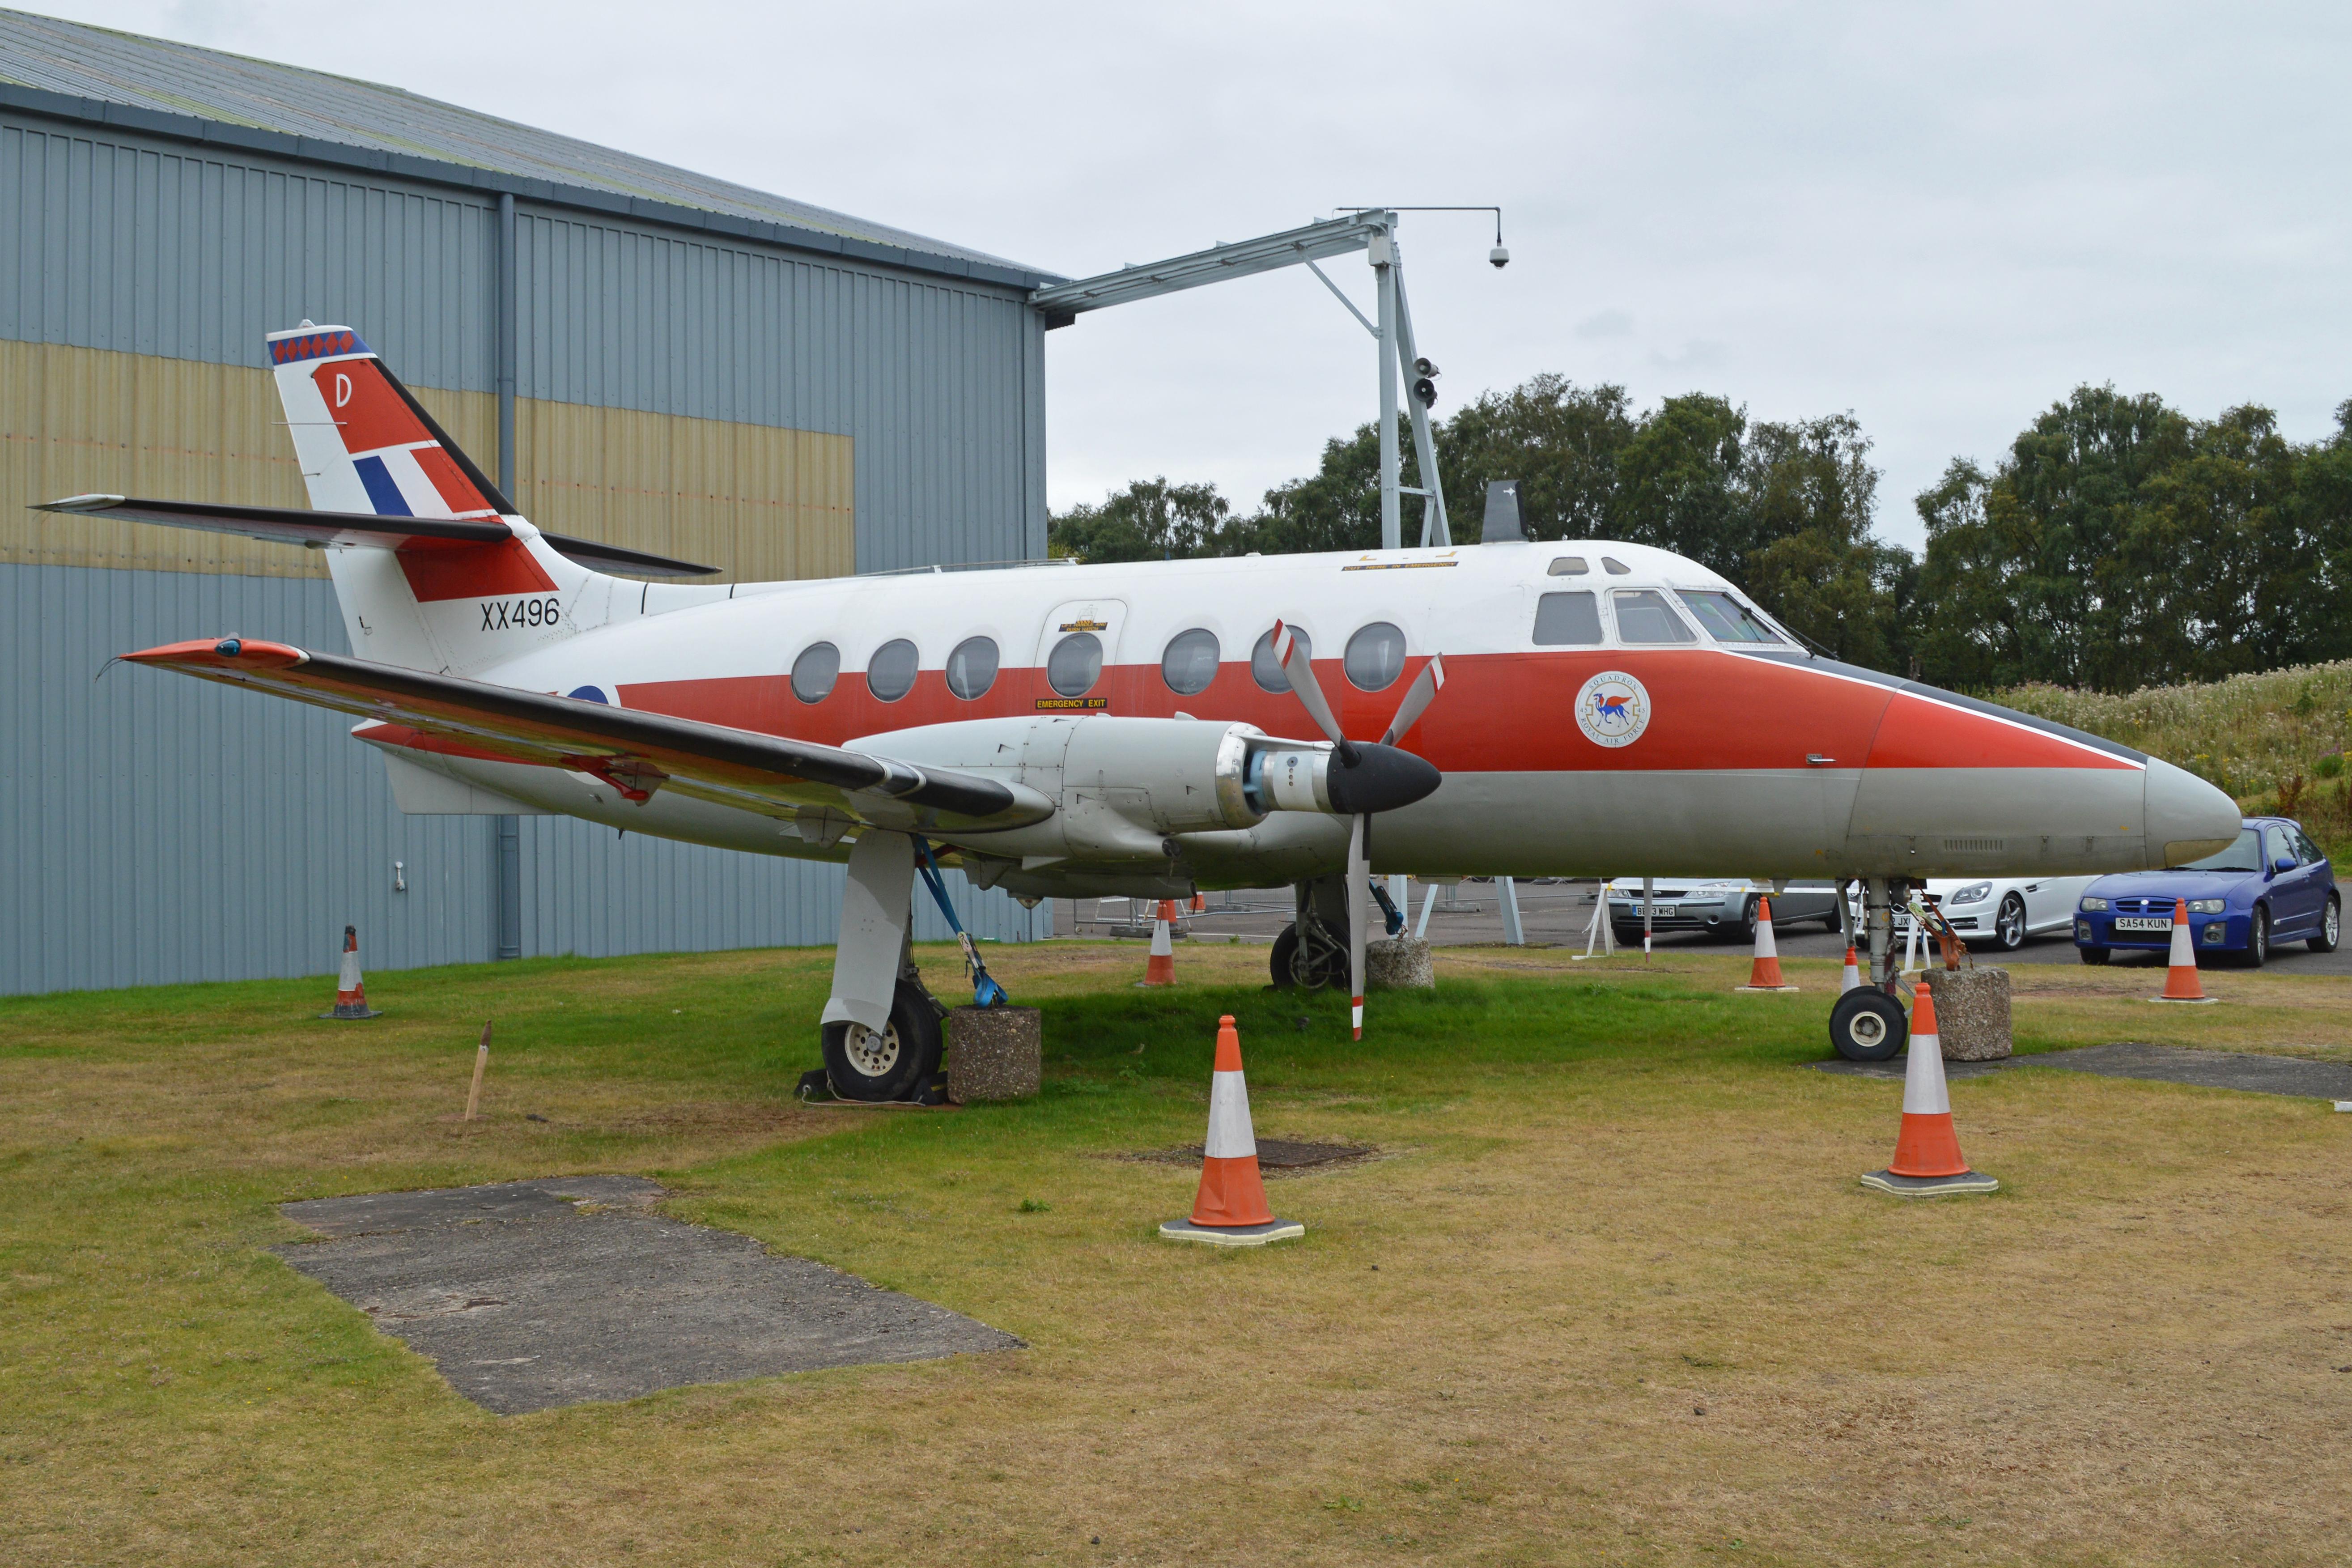 File:Scottish Aviation Jetstream T 1 'XX496 D' (36676524976